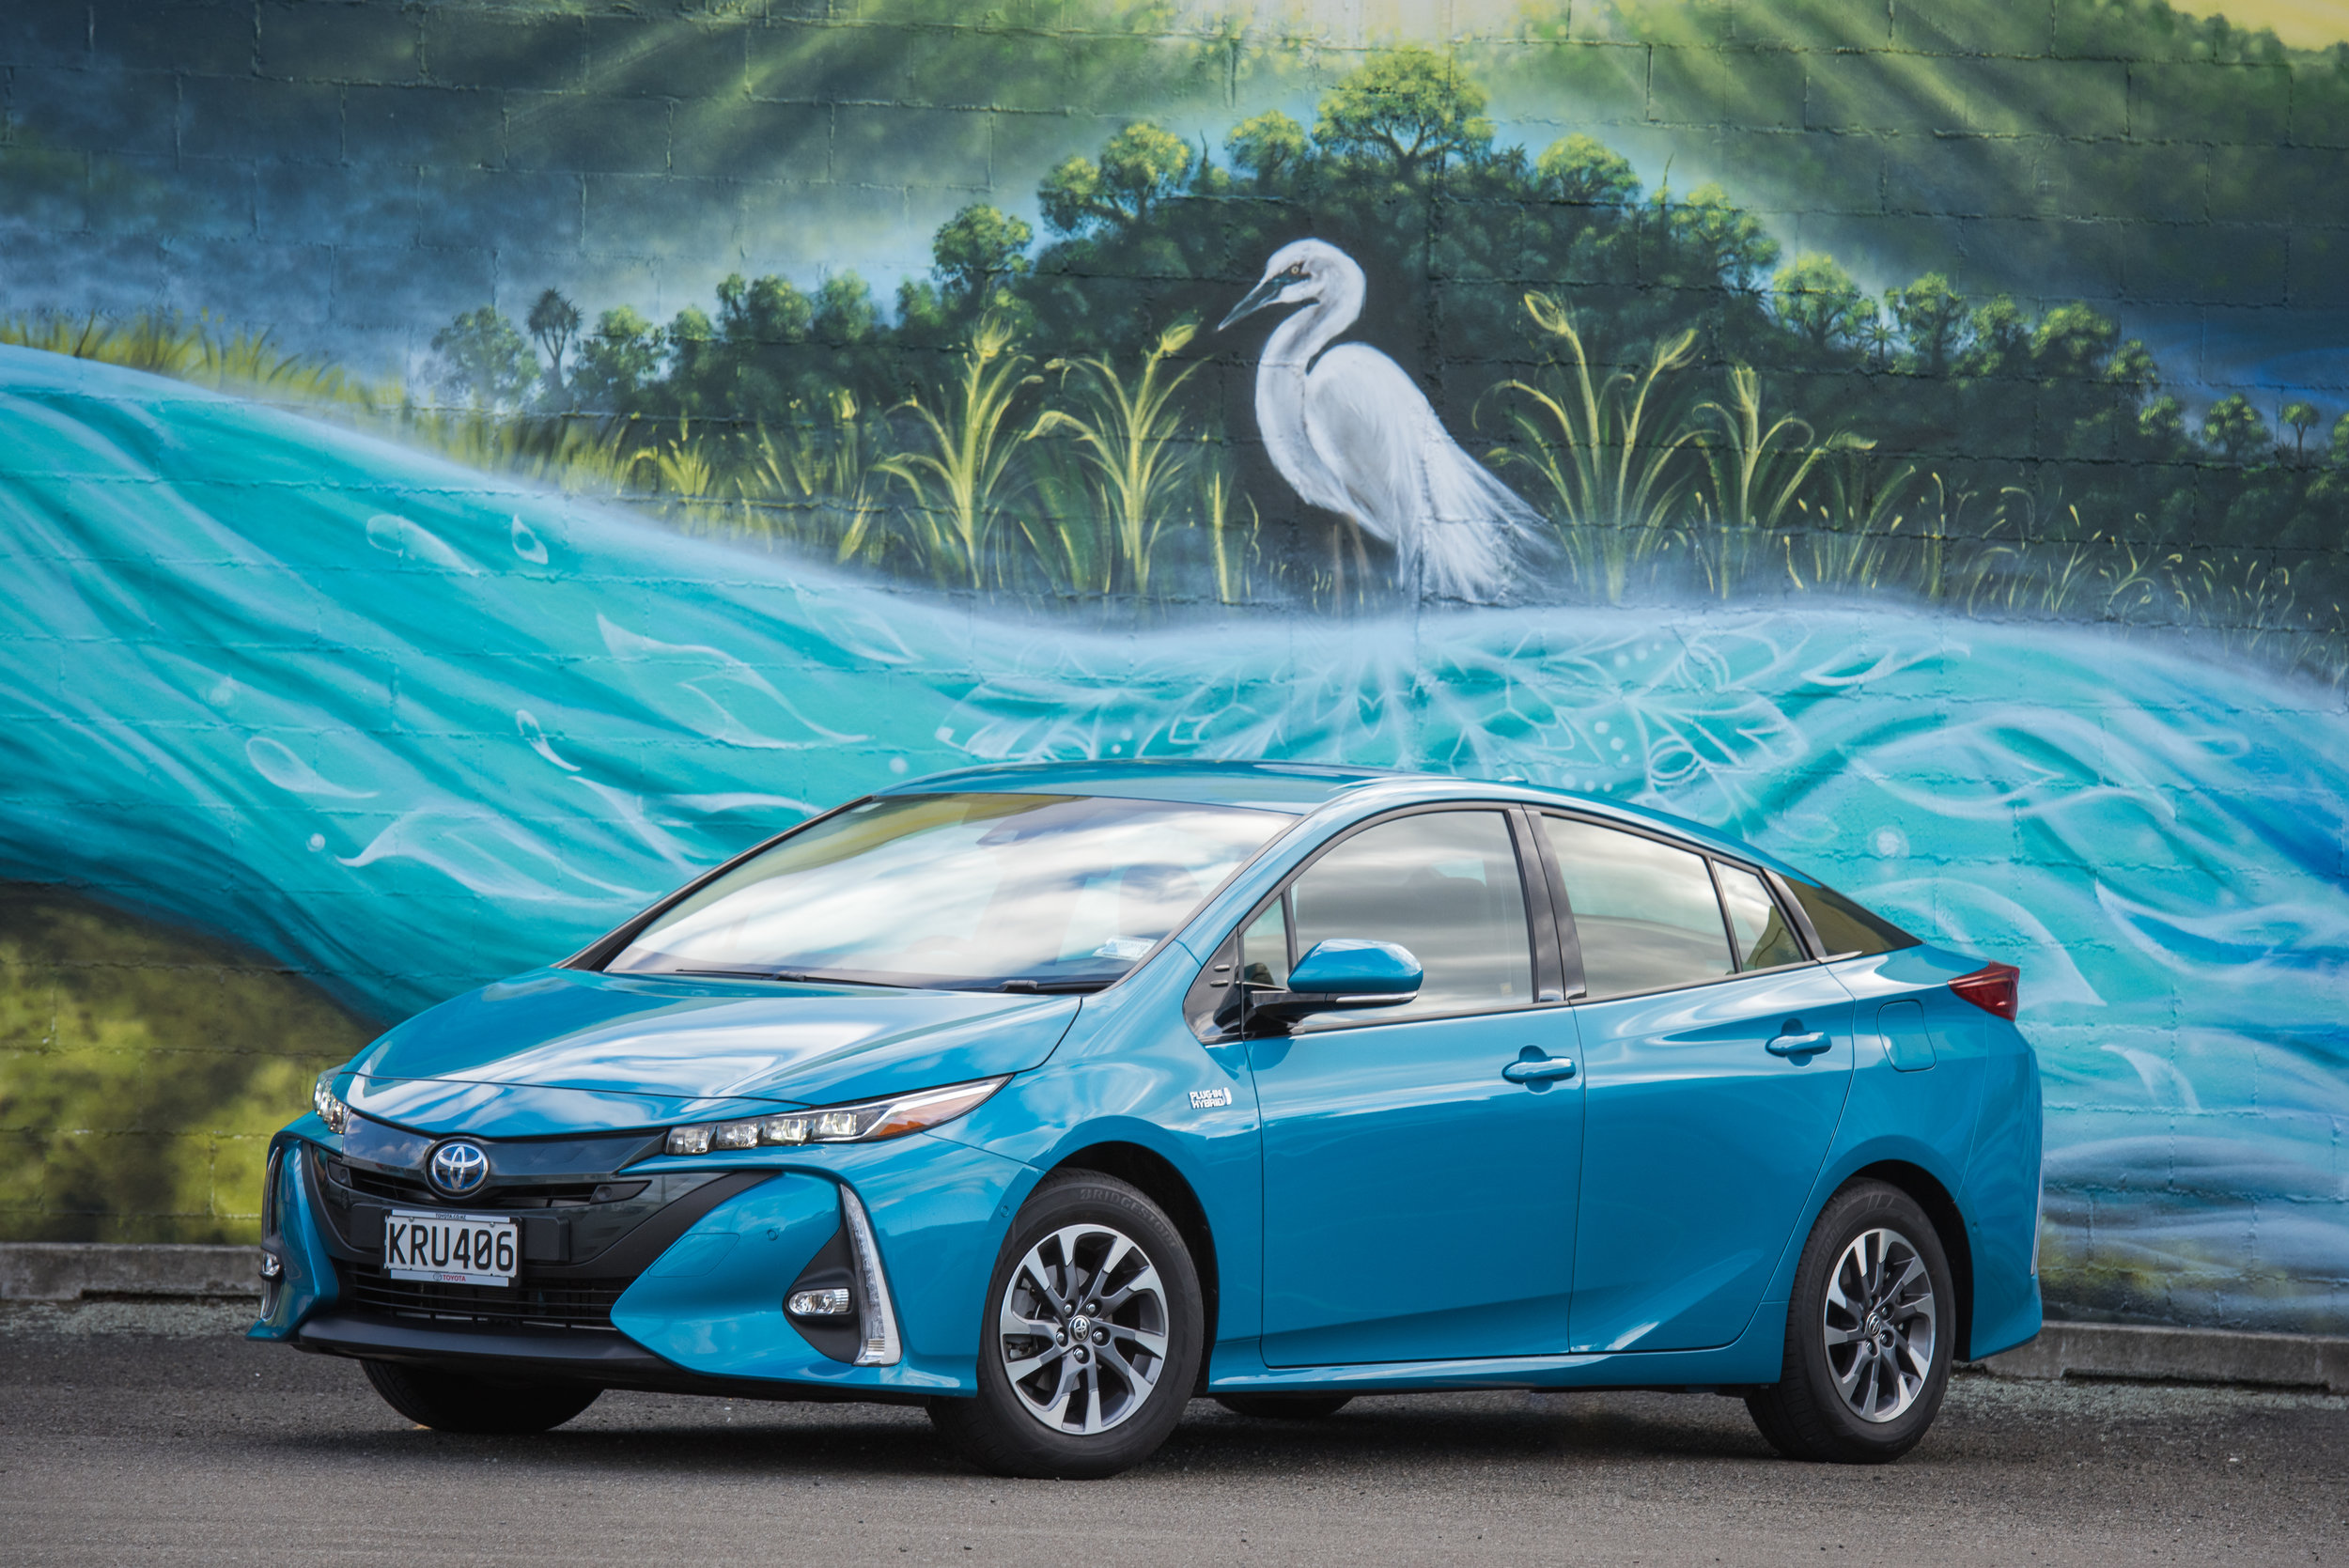 2018 Toyota Prius Prime, Blue magnetism, front three quarter shot, mural close-up.jpg